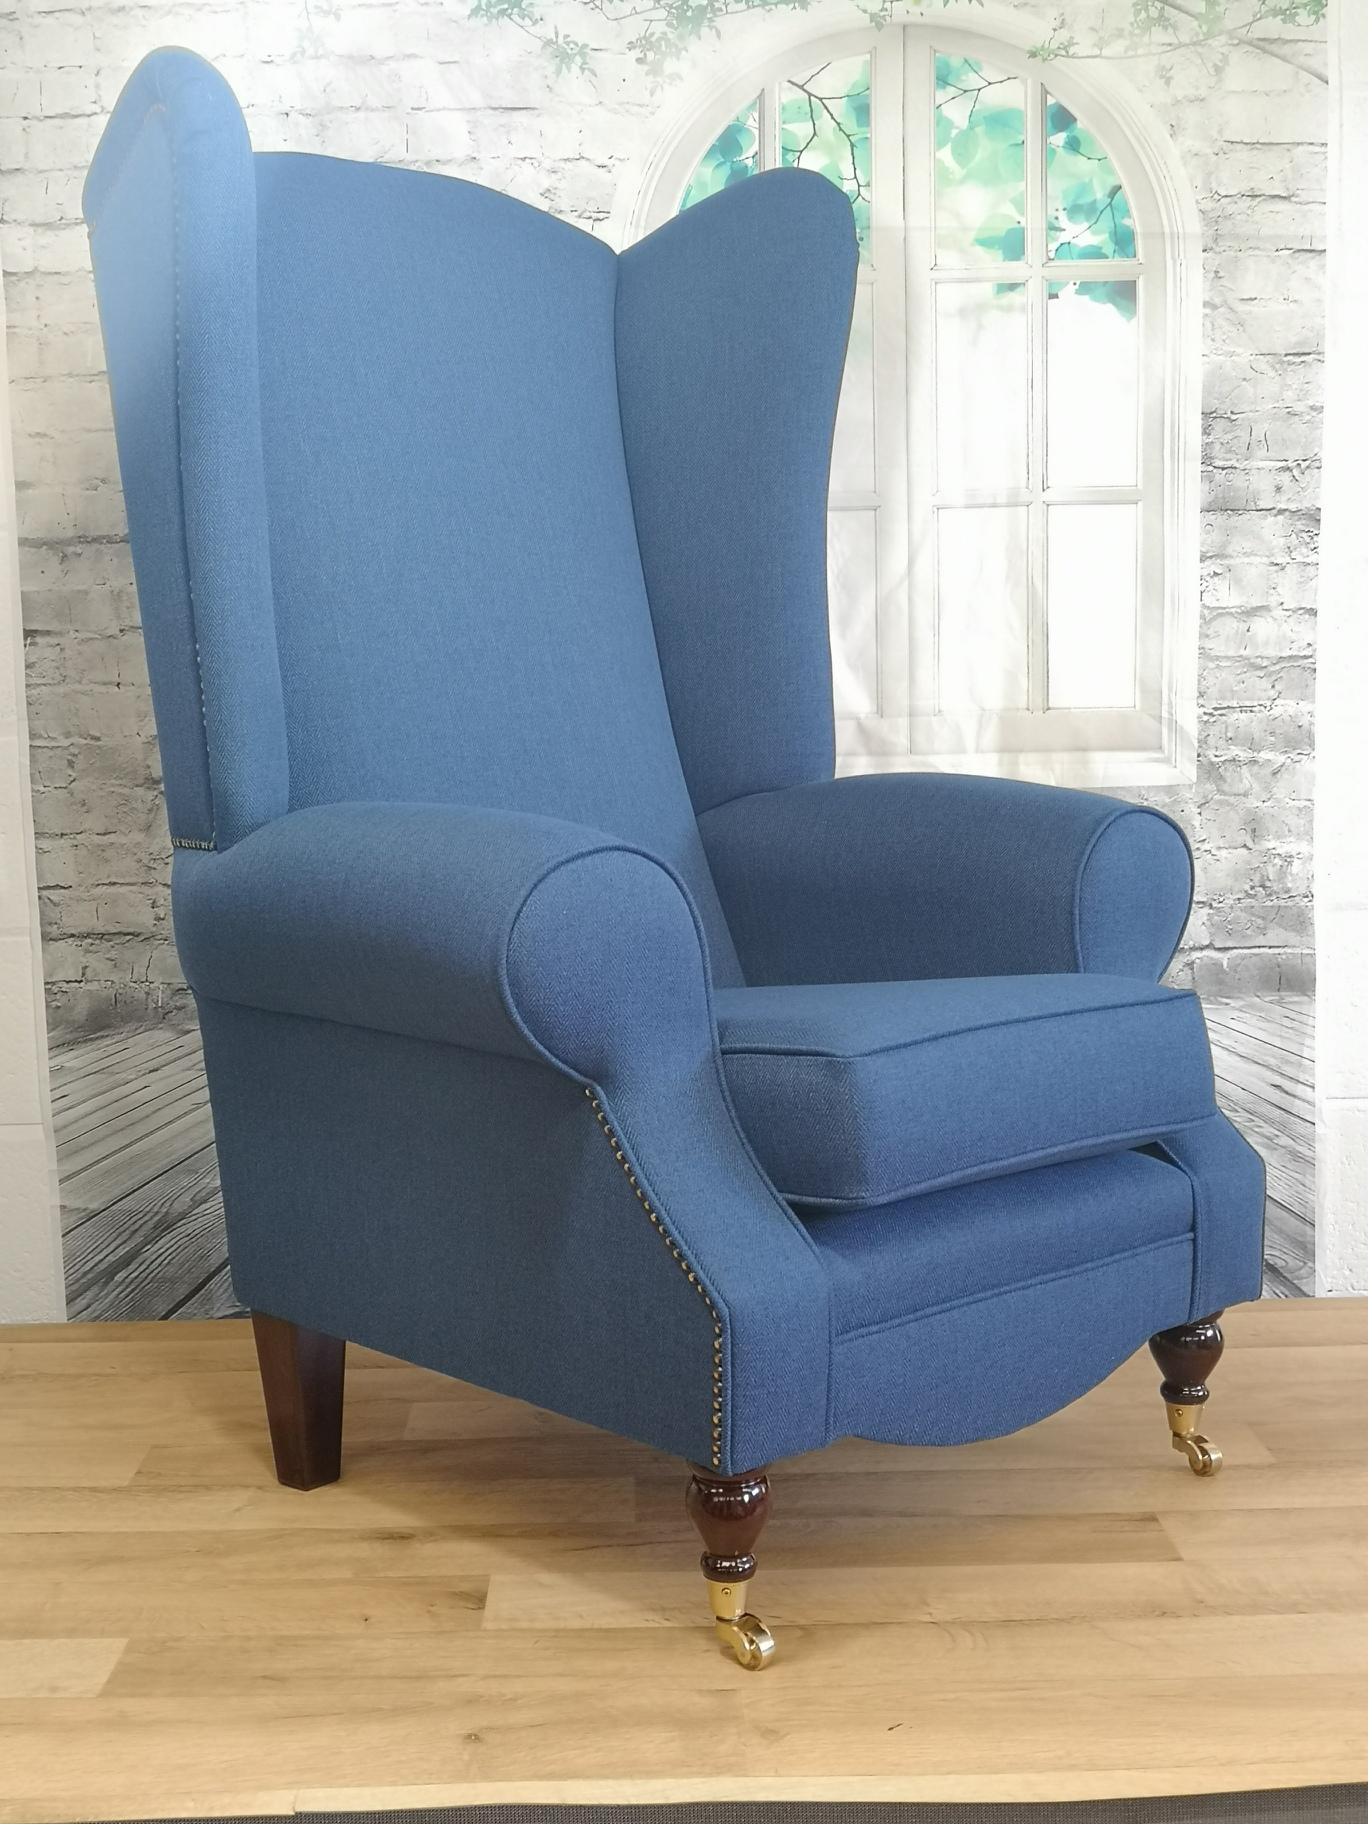 Wing Back Queen Anne Fireside Extra Tall High Back Chair Denim Blue Herringbone Fabric Metro Furniture